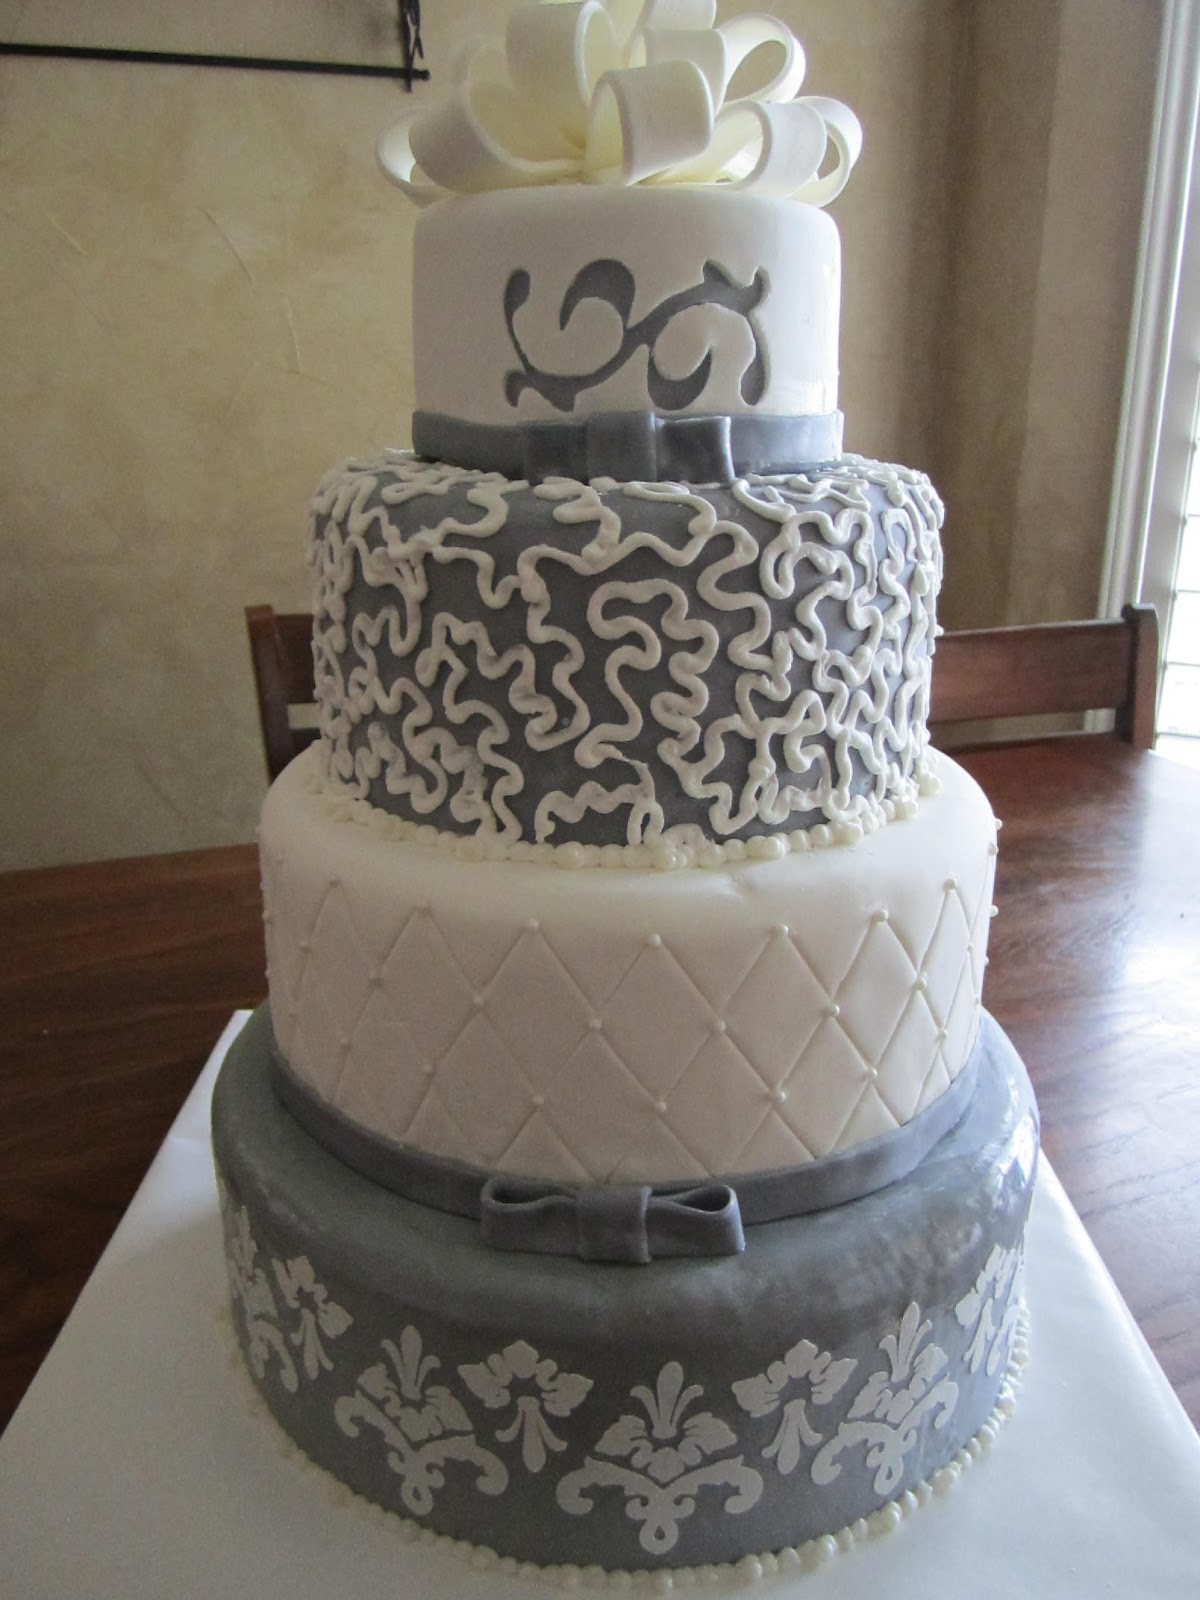 Frosted Insanity Grey Wedding Cake